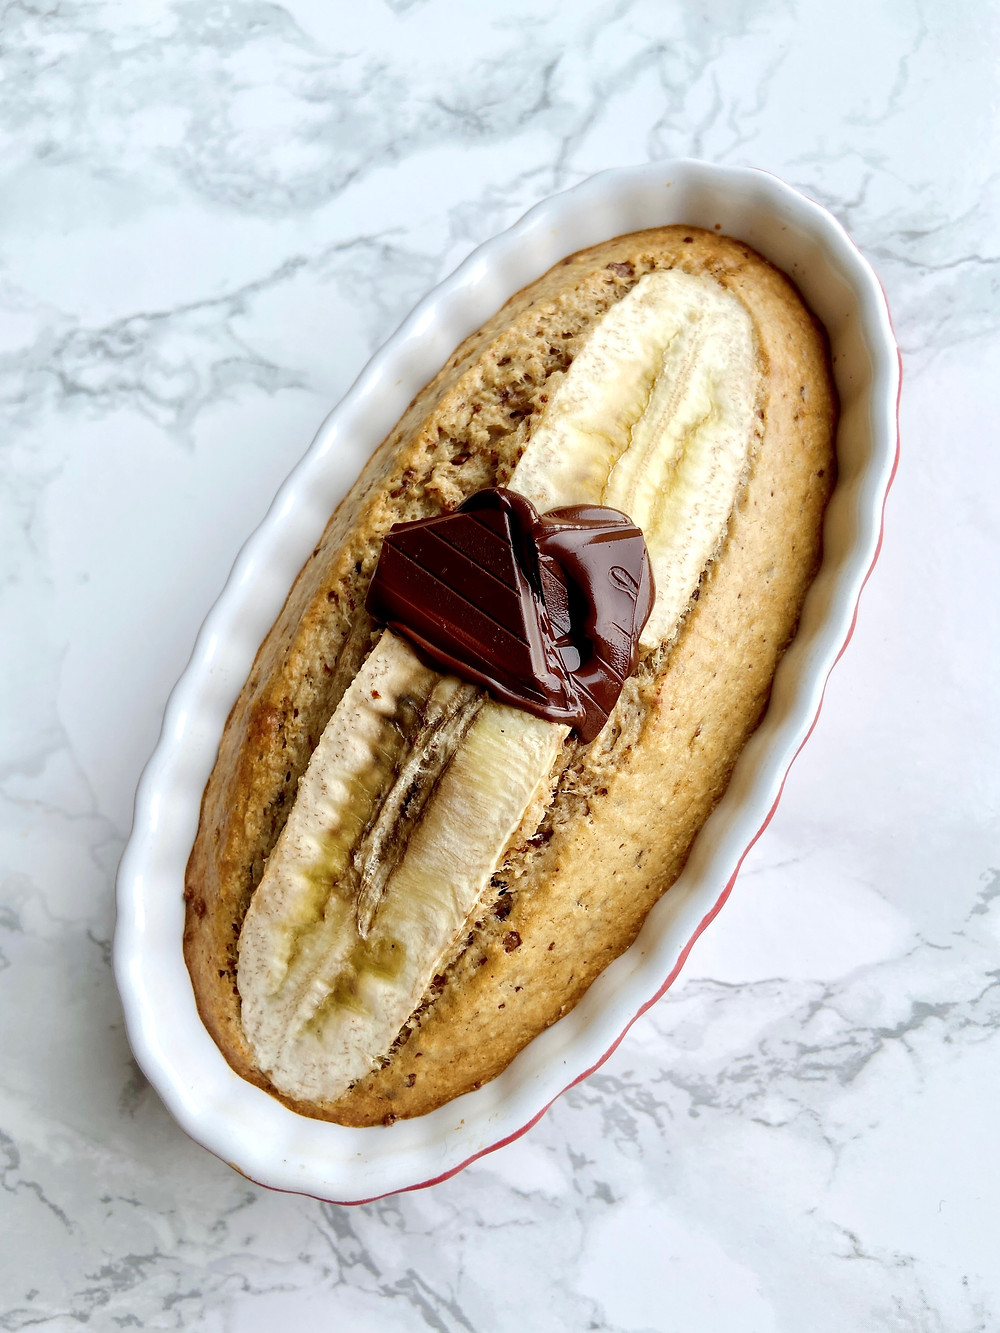 Peanut Butter & Banana Baked Oatmeal